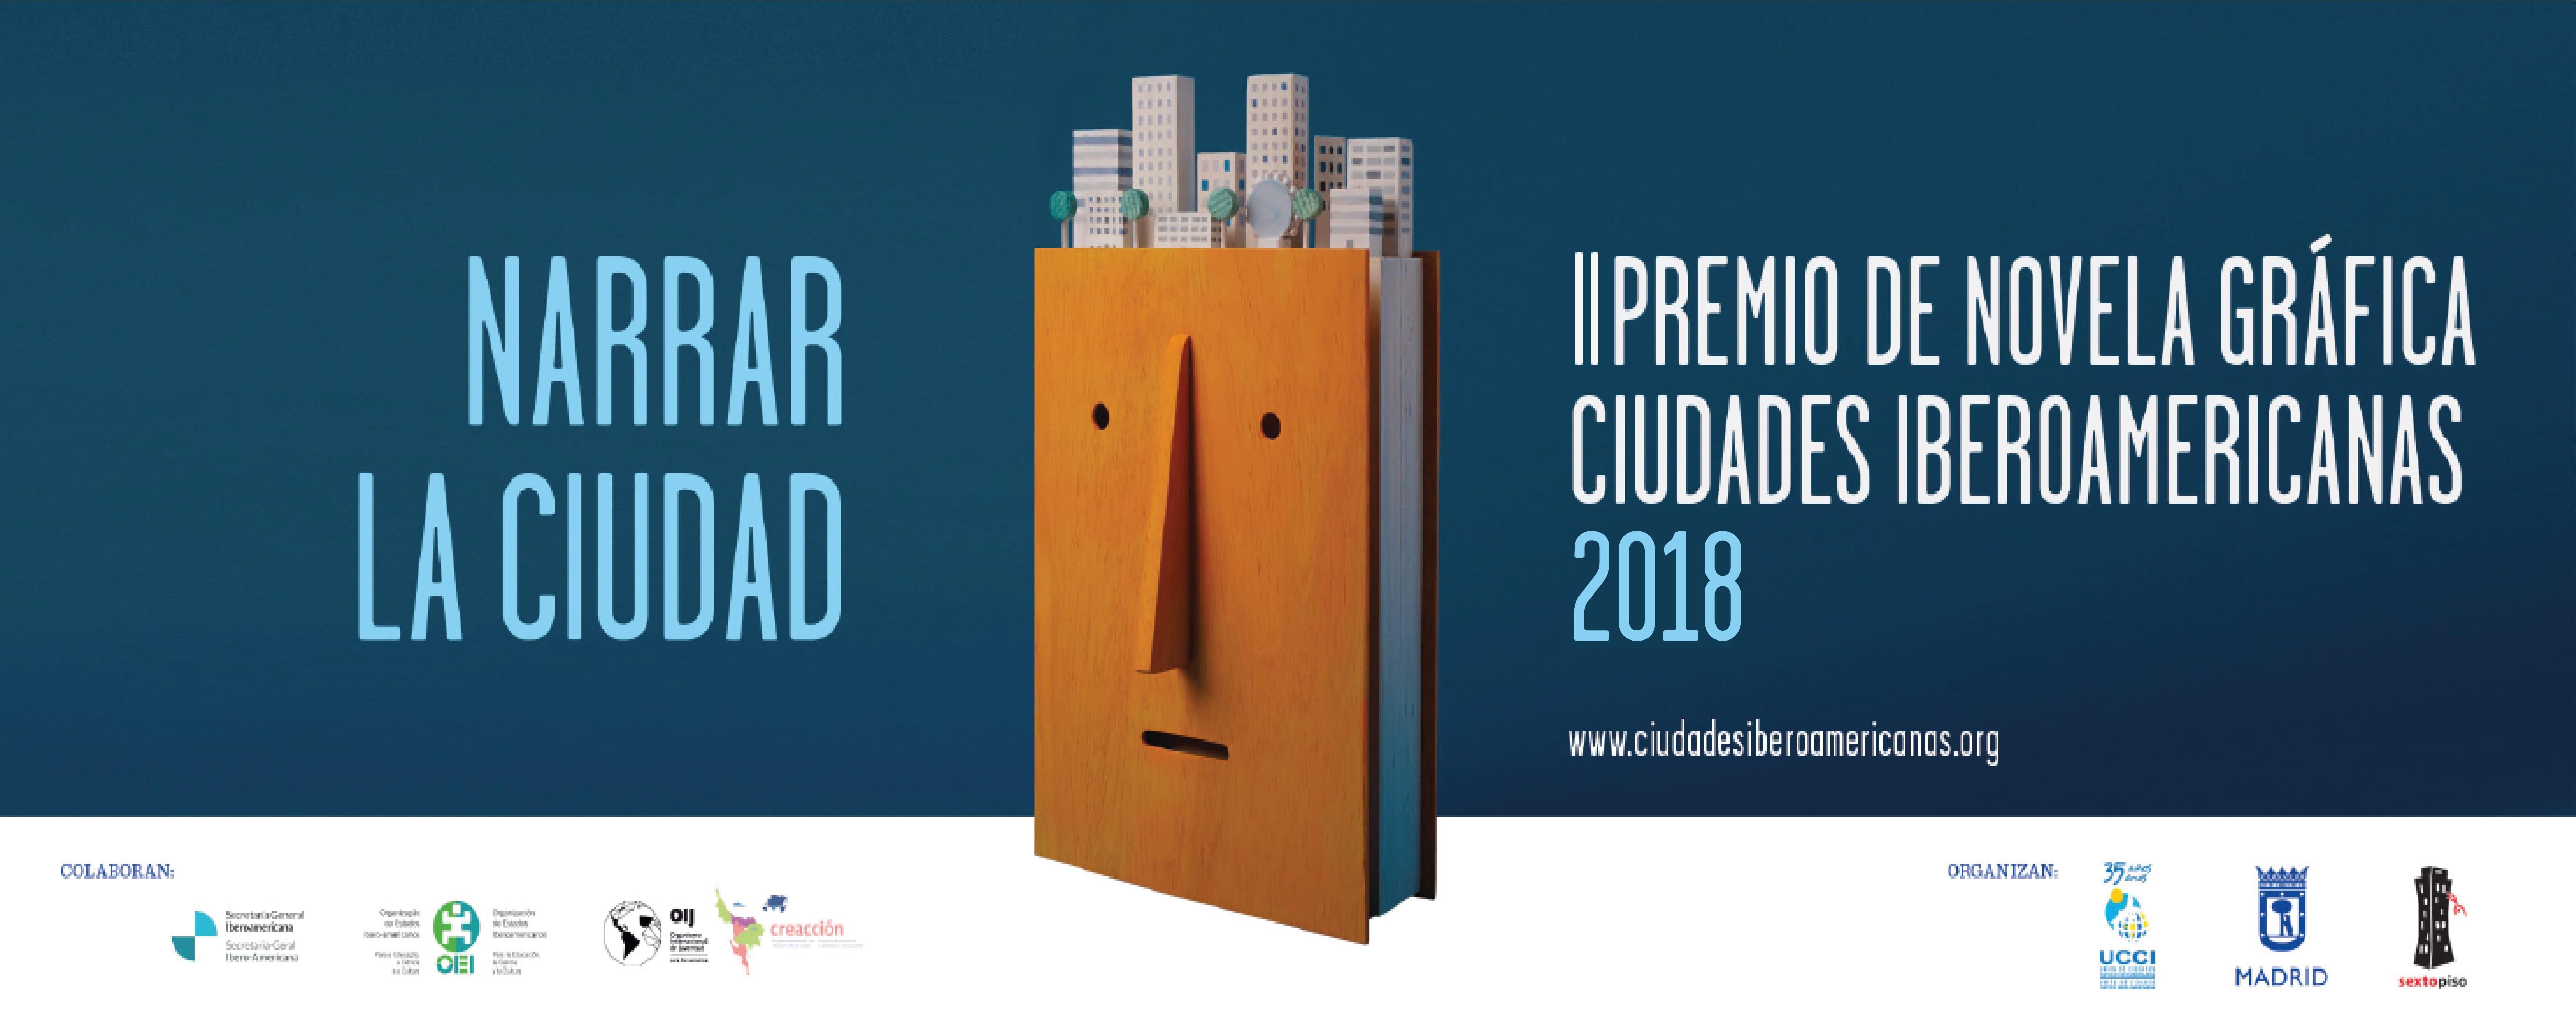 Bases Del Ii Premio De Novela Gráfica Ciudades